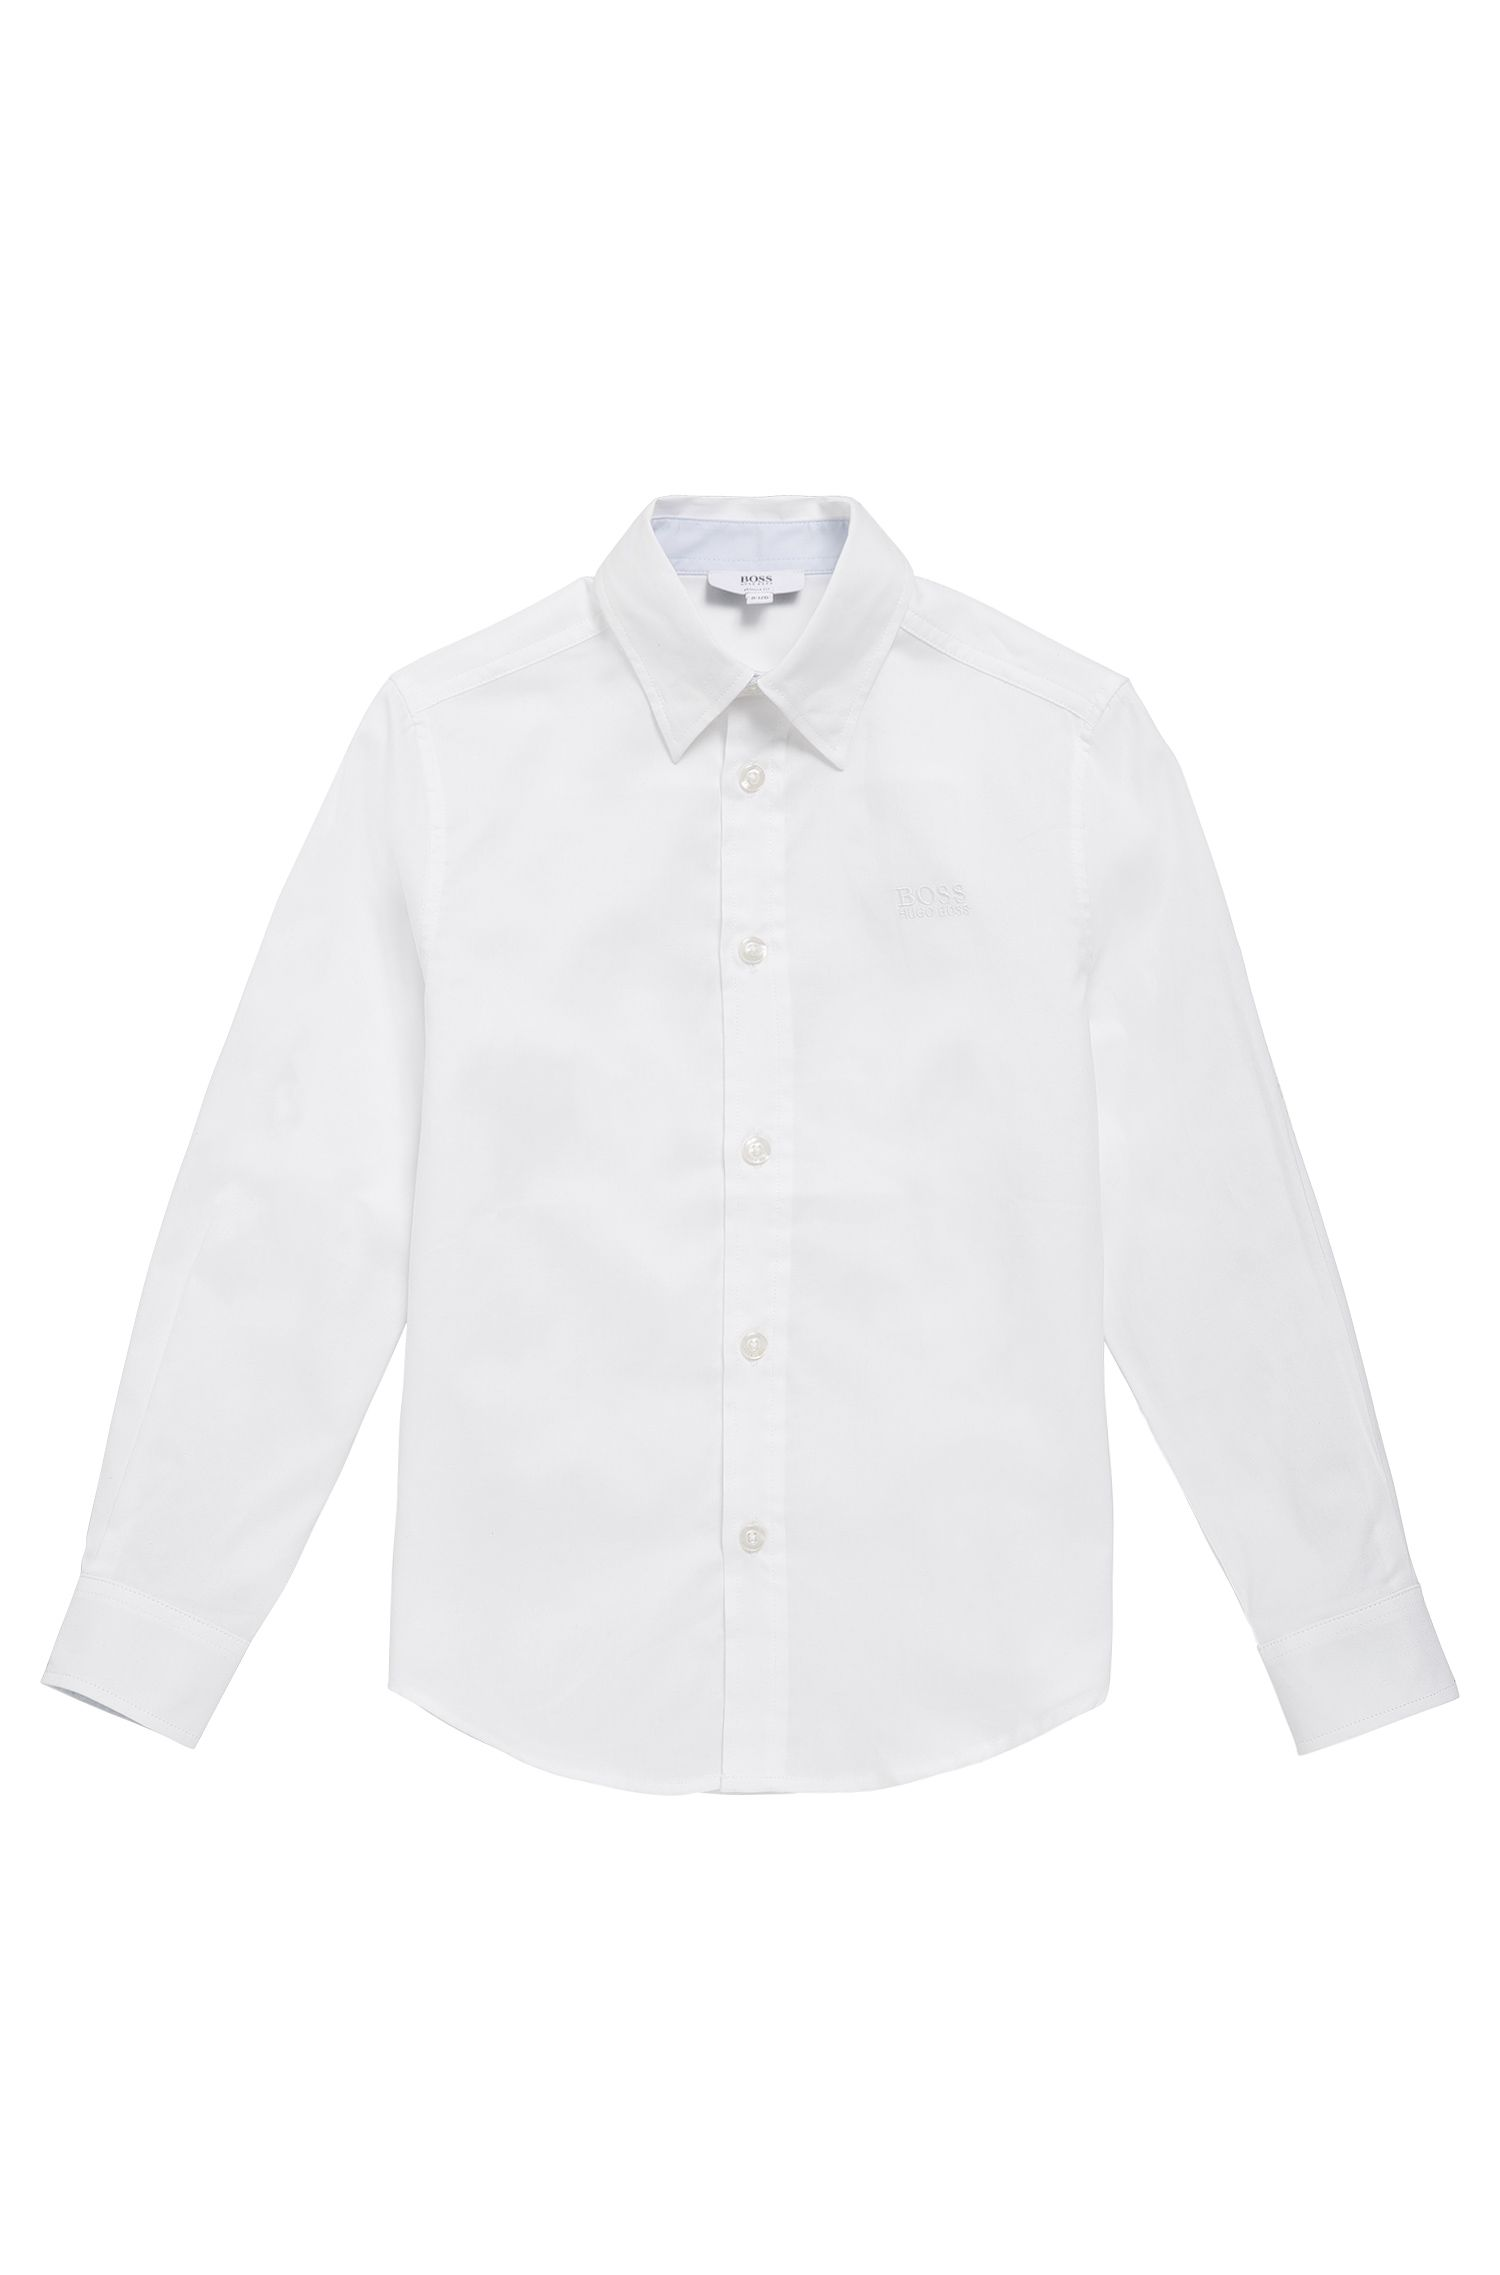 Kids' shirt in lightly textured cotton: 'J25977'